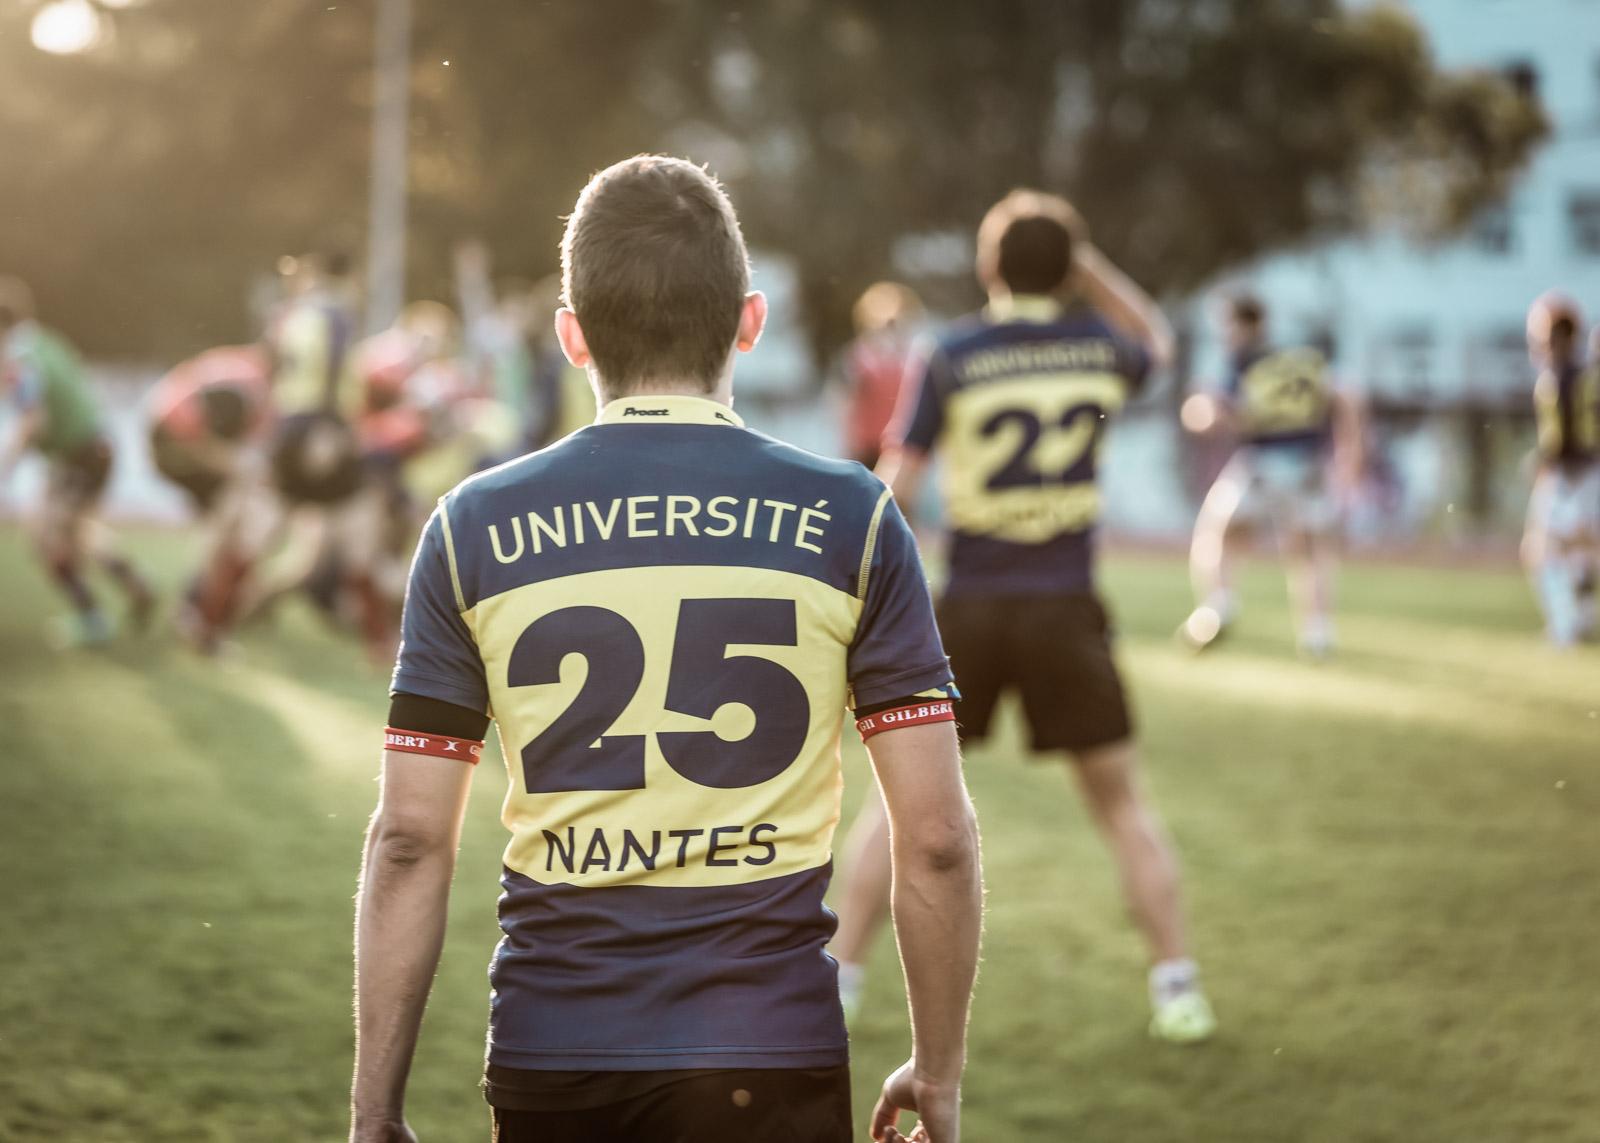 University sports